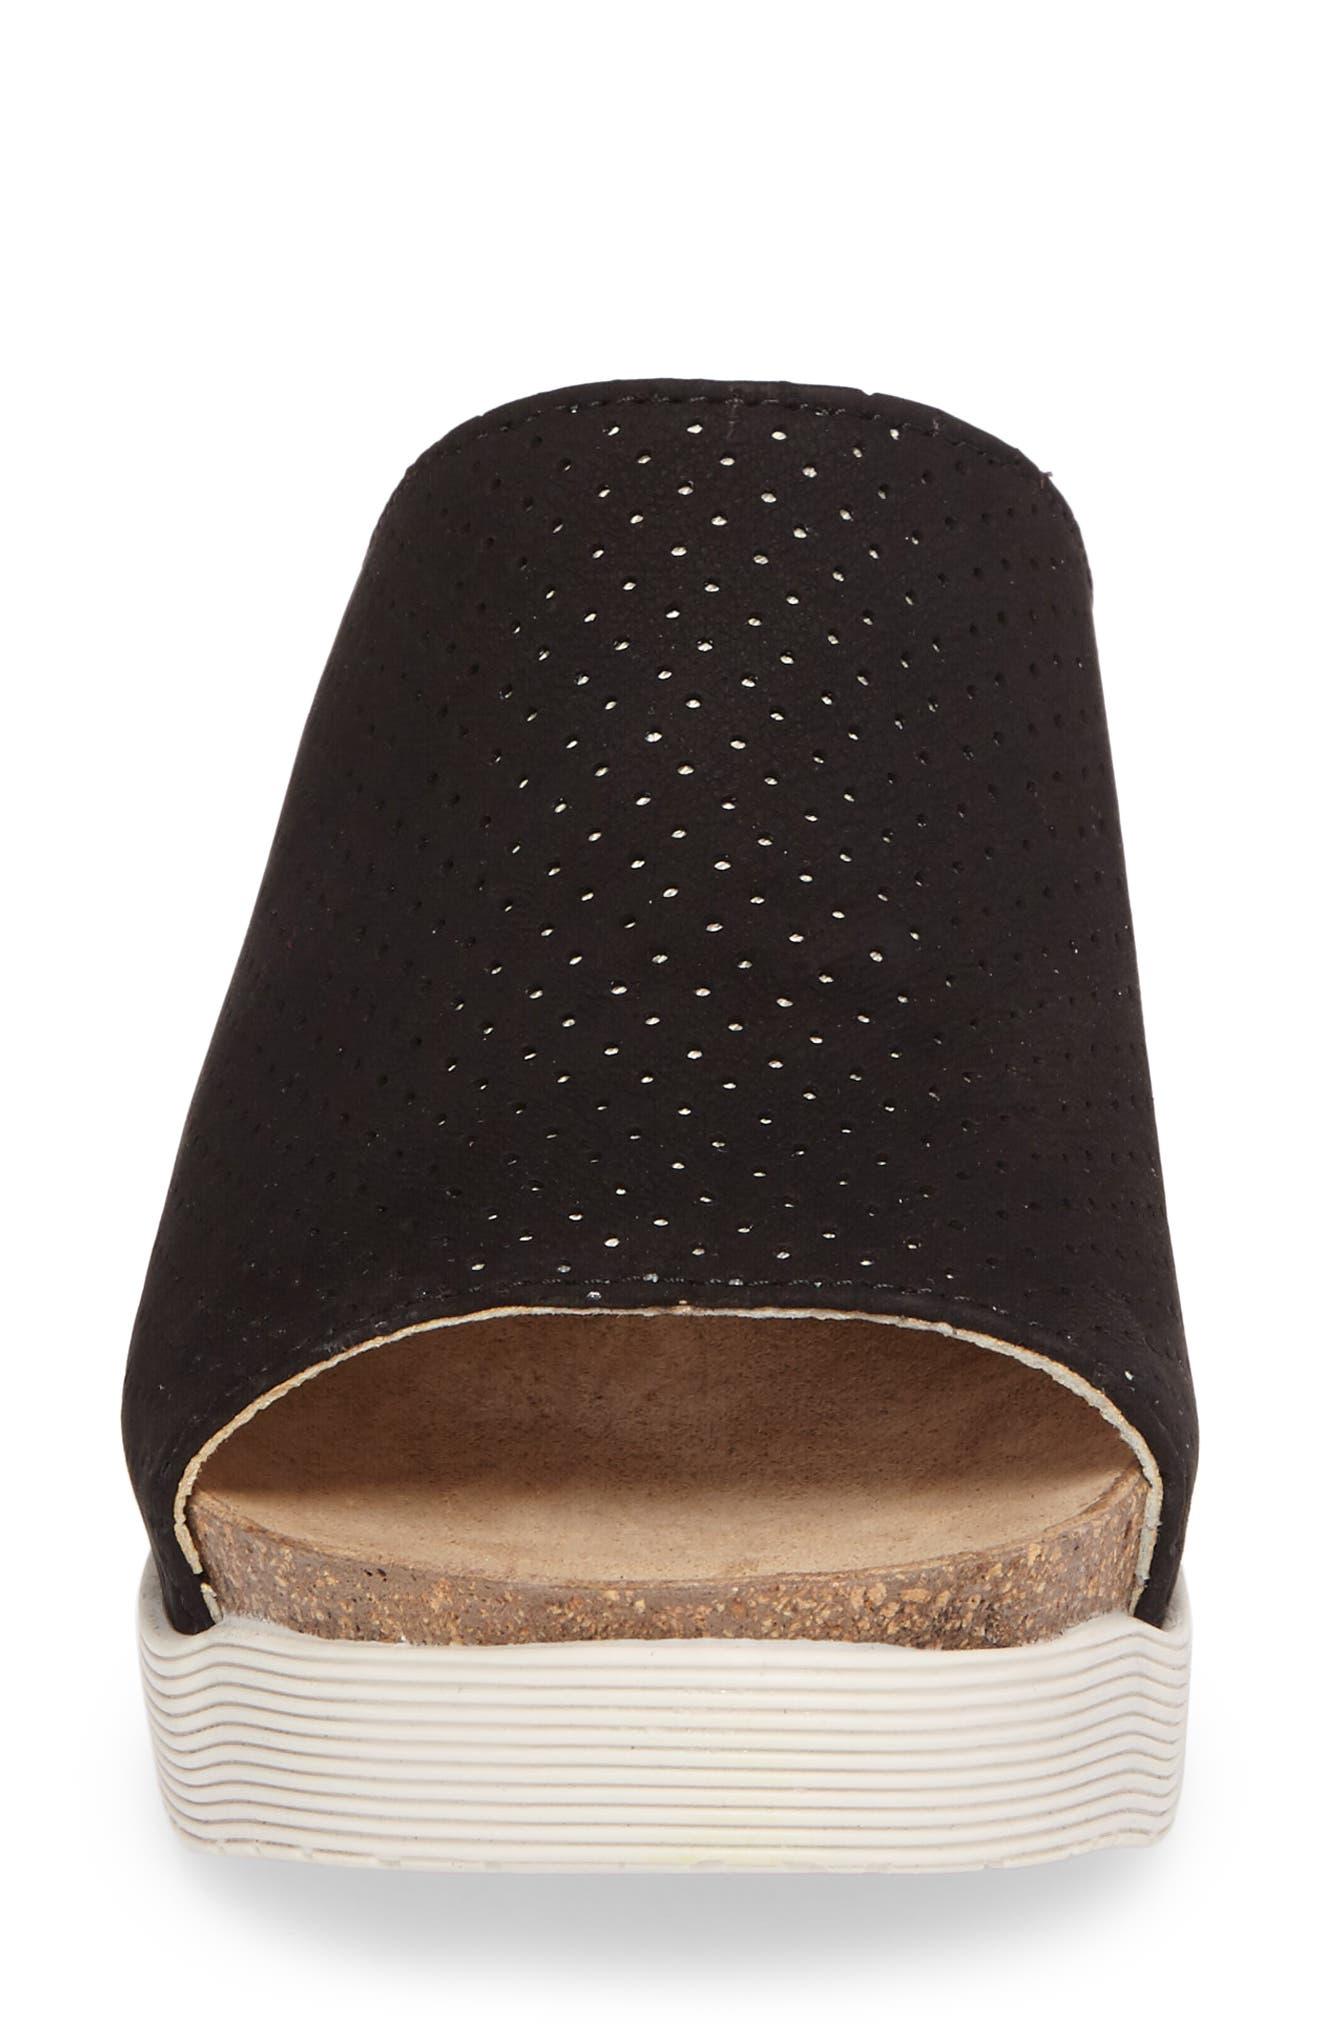 Whin Platform Sandal,                             Alternate thumbnail 4, color,                             BLACK CUPIDO LEATHER